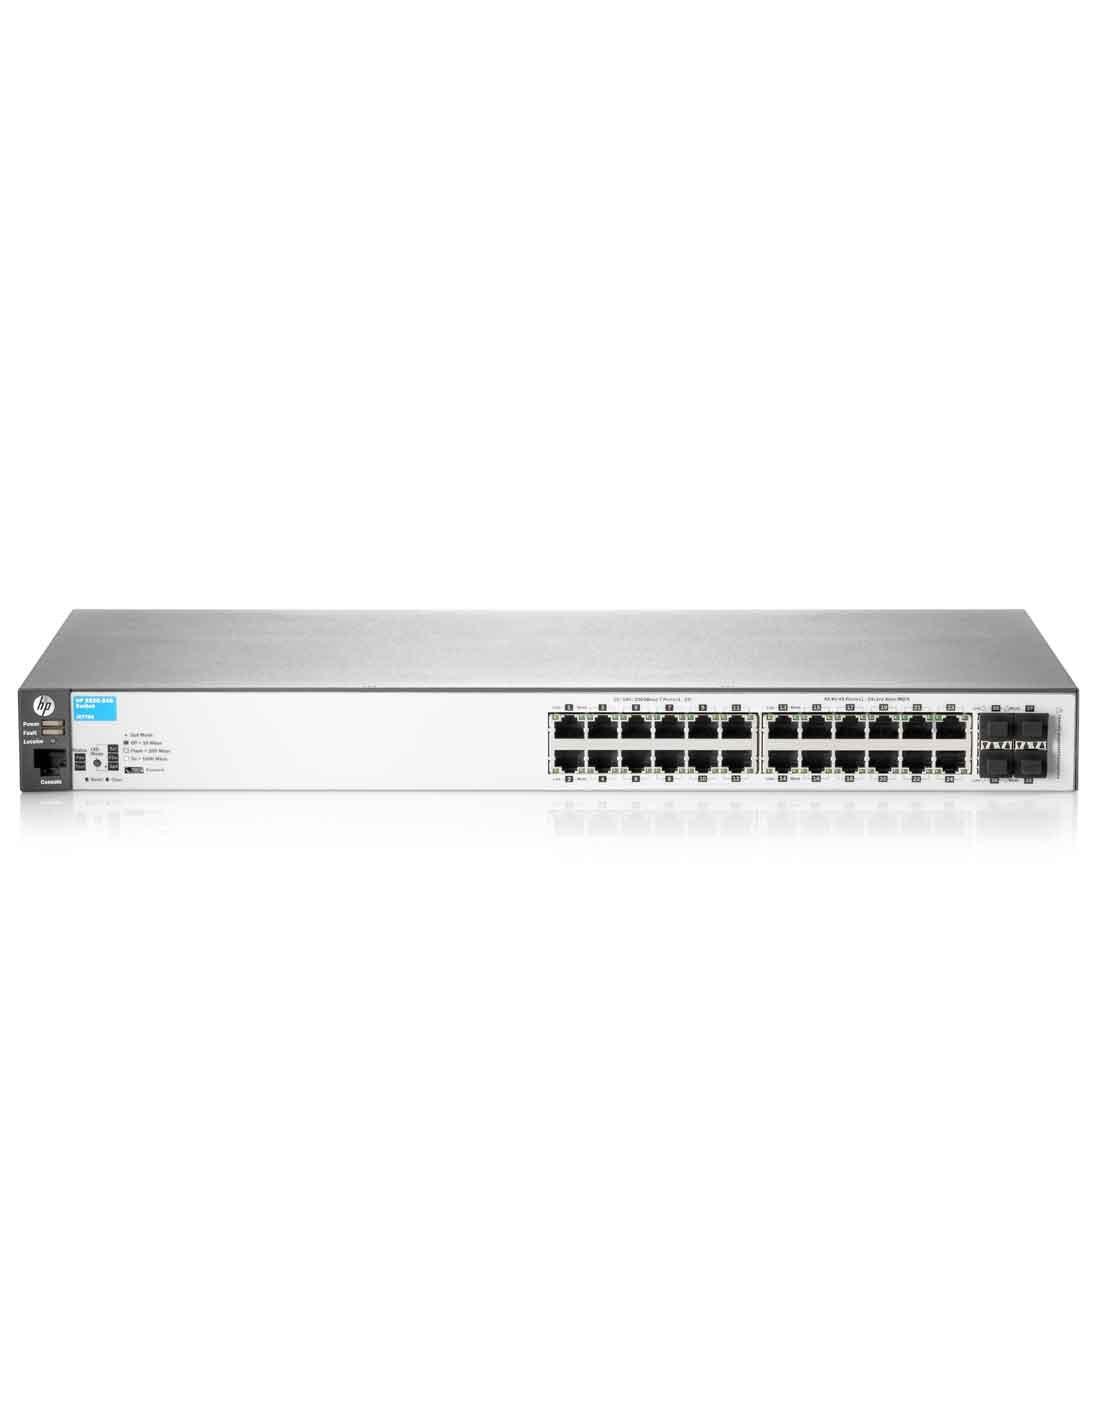 Aruba 2530 24G Switch J9776A Dubai Online Store